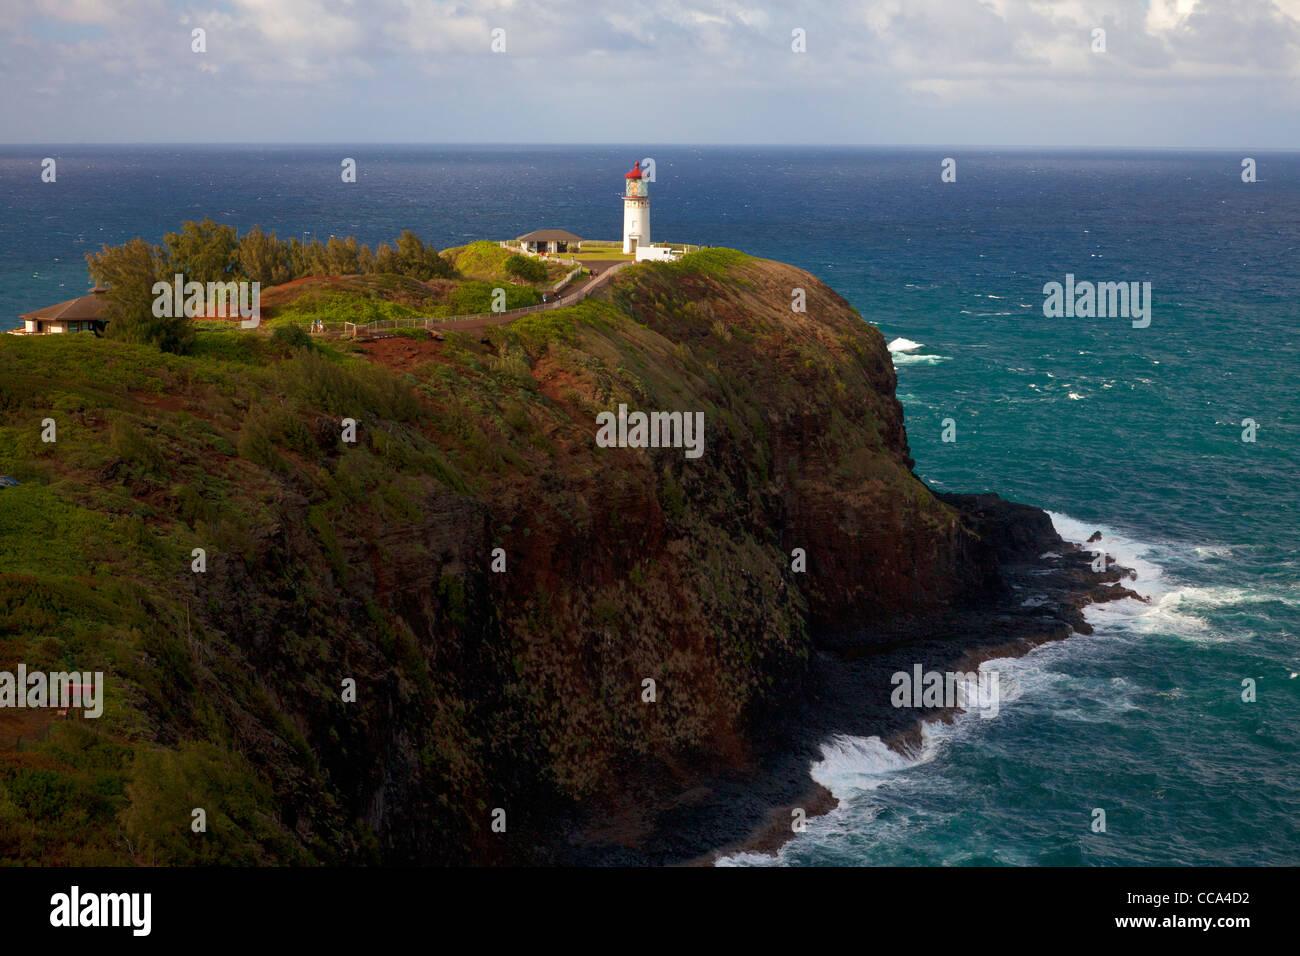 Kilauea Lighthouse, Kauai, Hawaii. - Stock Image